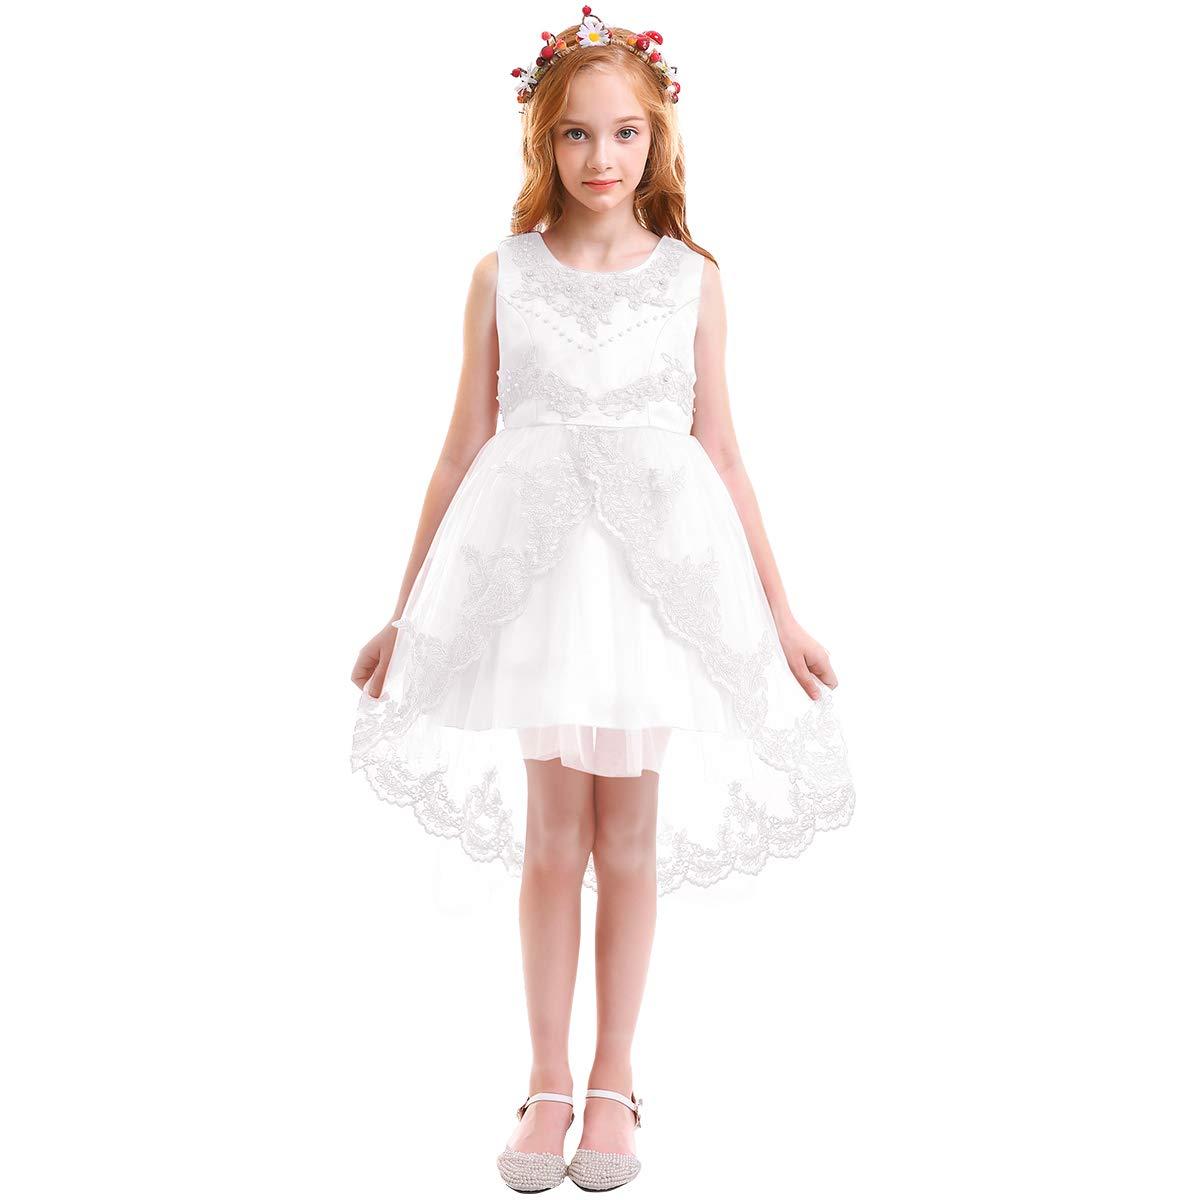 2018 Hi-Lo Princess Pageant Wedding Communion Party Prom Flower Girls Dress New